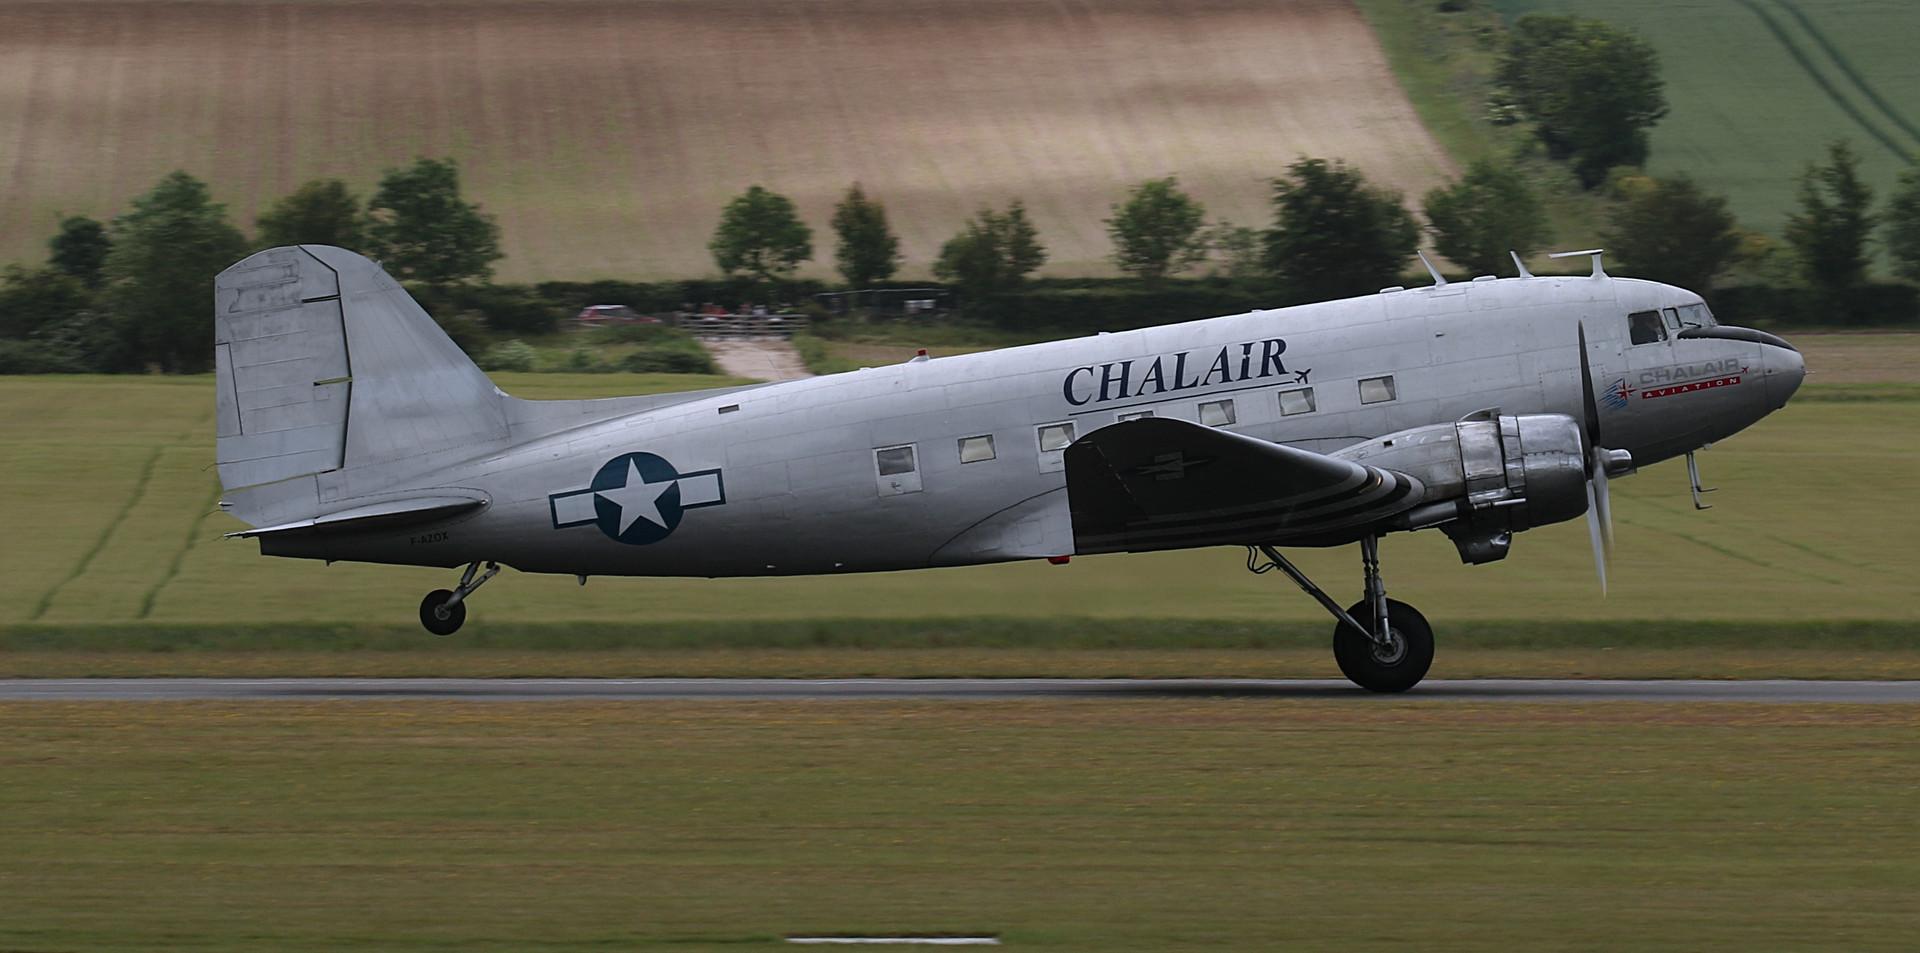 Chalair Daks over Duxford June 2019 (79)